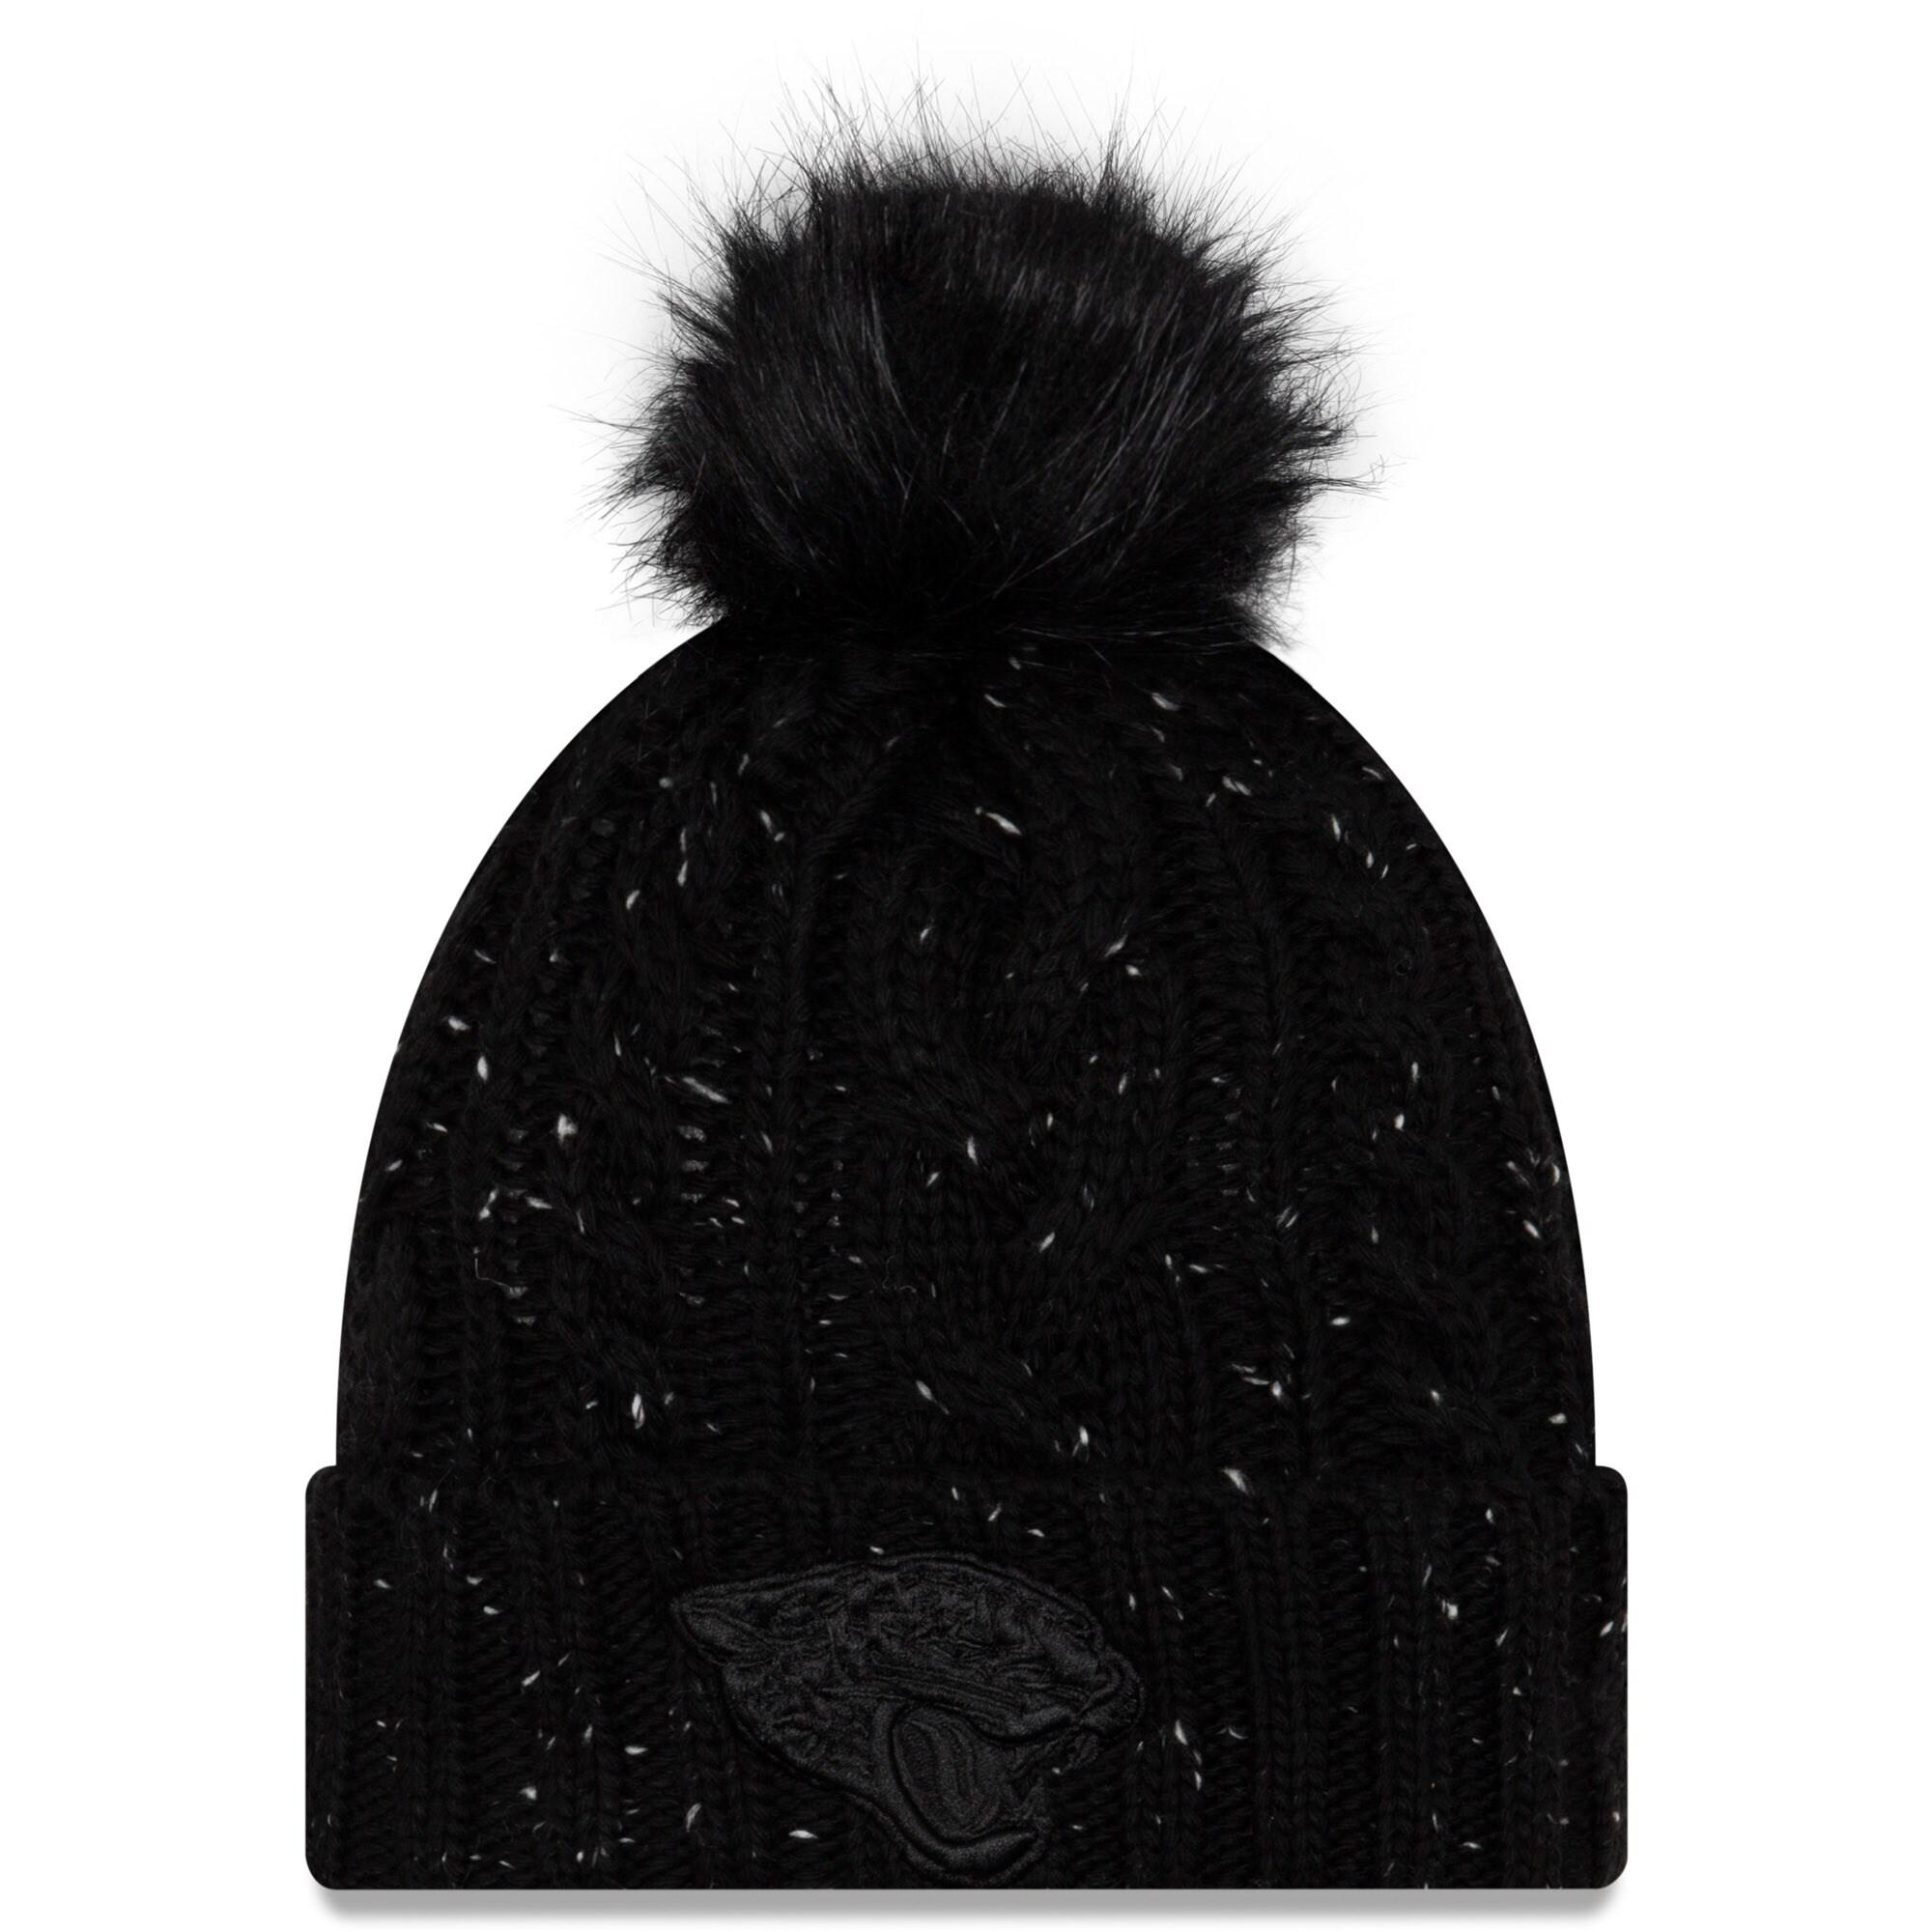 Jacksonville Jaguars New Era Women's Cuffed Knit Hat with Fuzzy Pom - Black